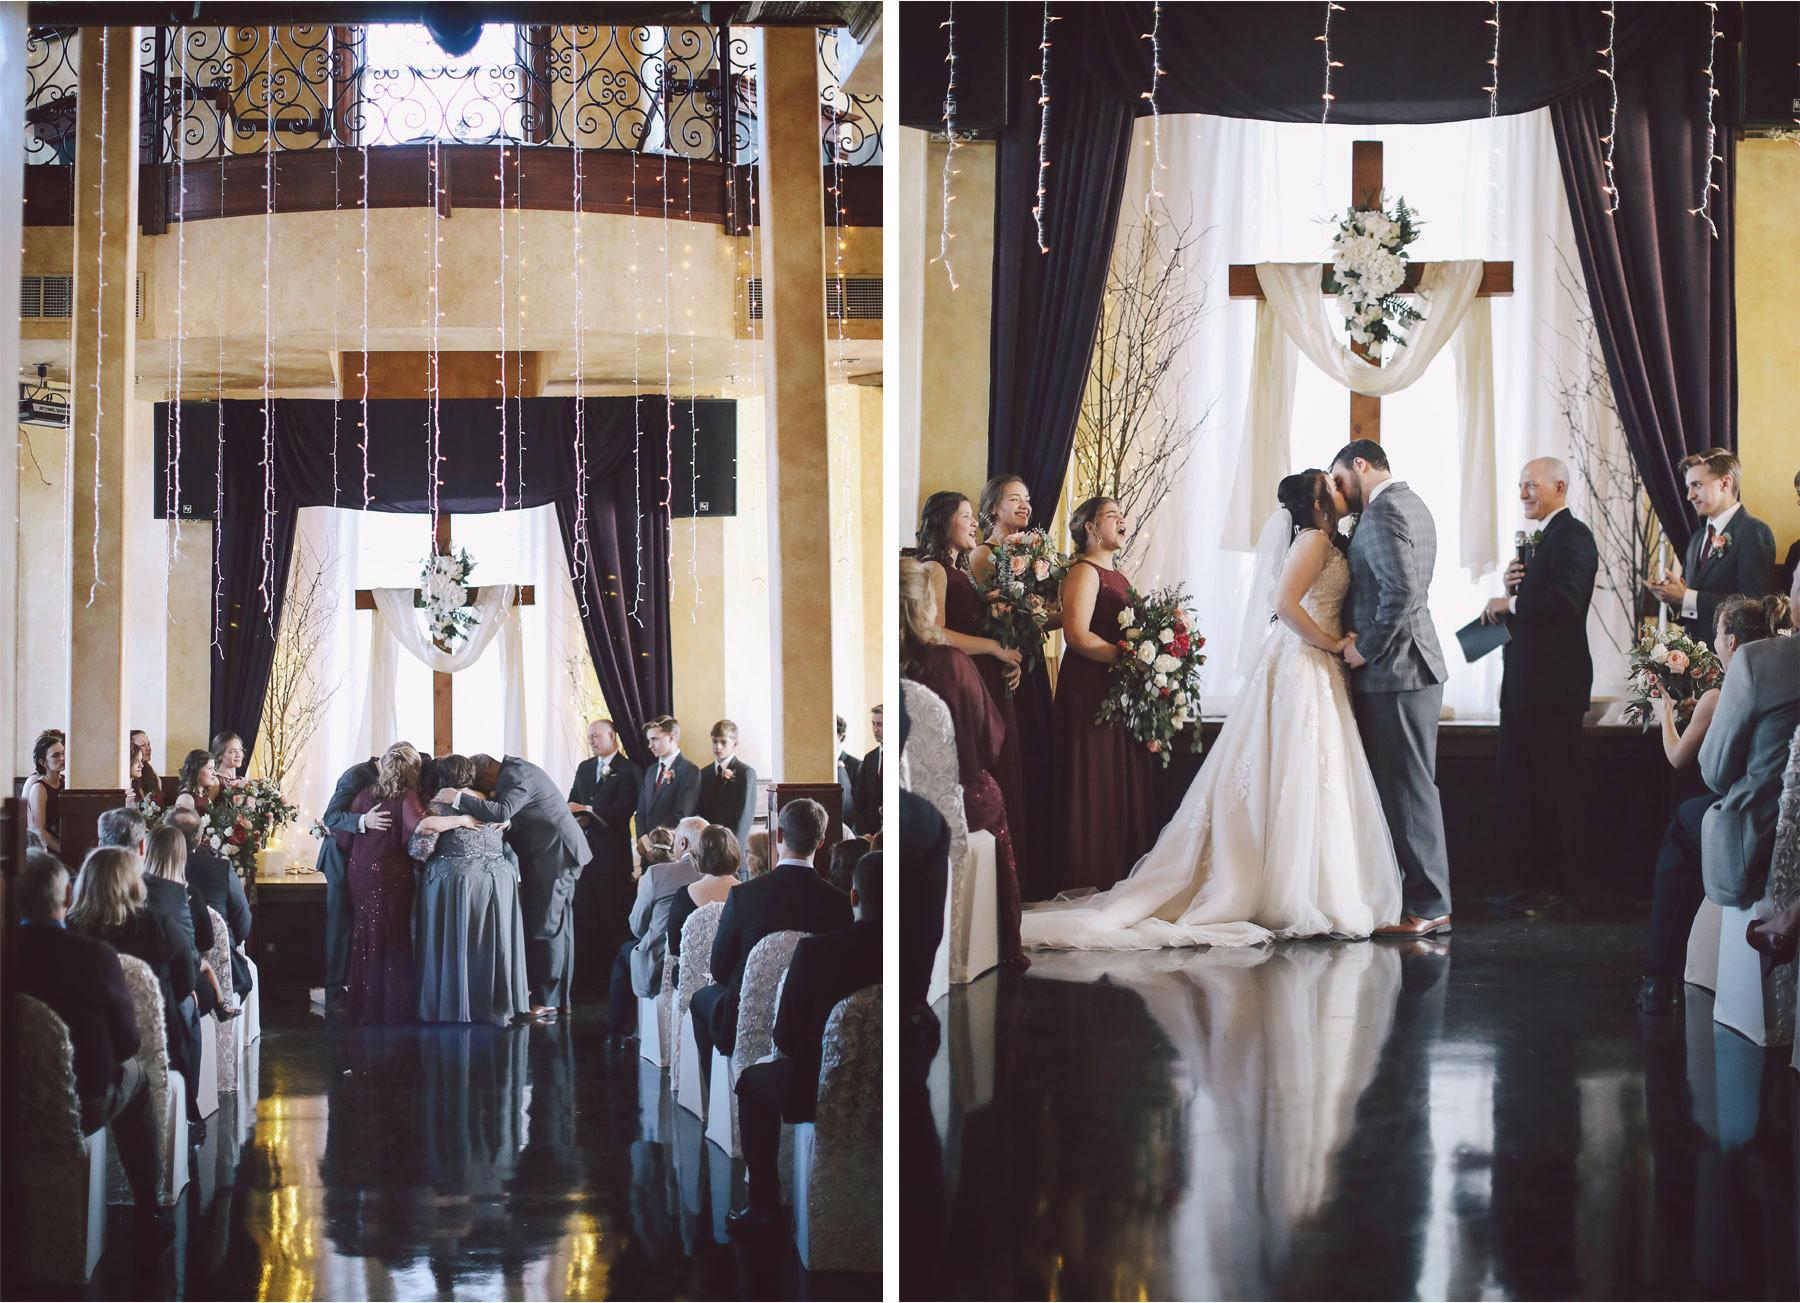 14-Minneapolis-Wedding-Photography-by-Vick-Photography-Historic-Concord-Exchange-Ceremony-Rachael-and-Benjamin.jpg